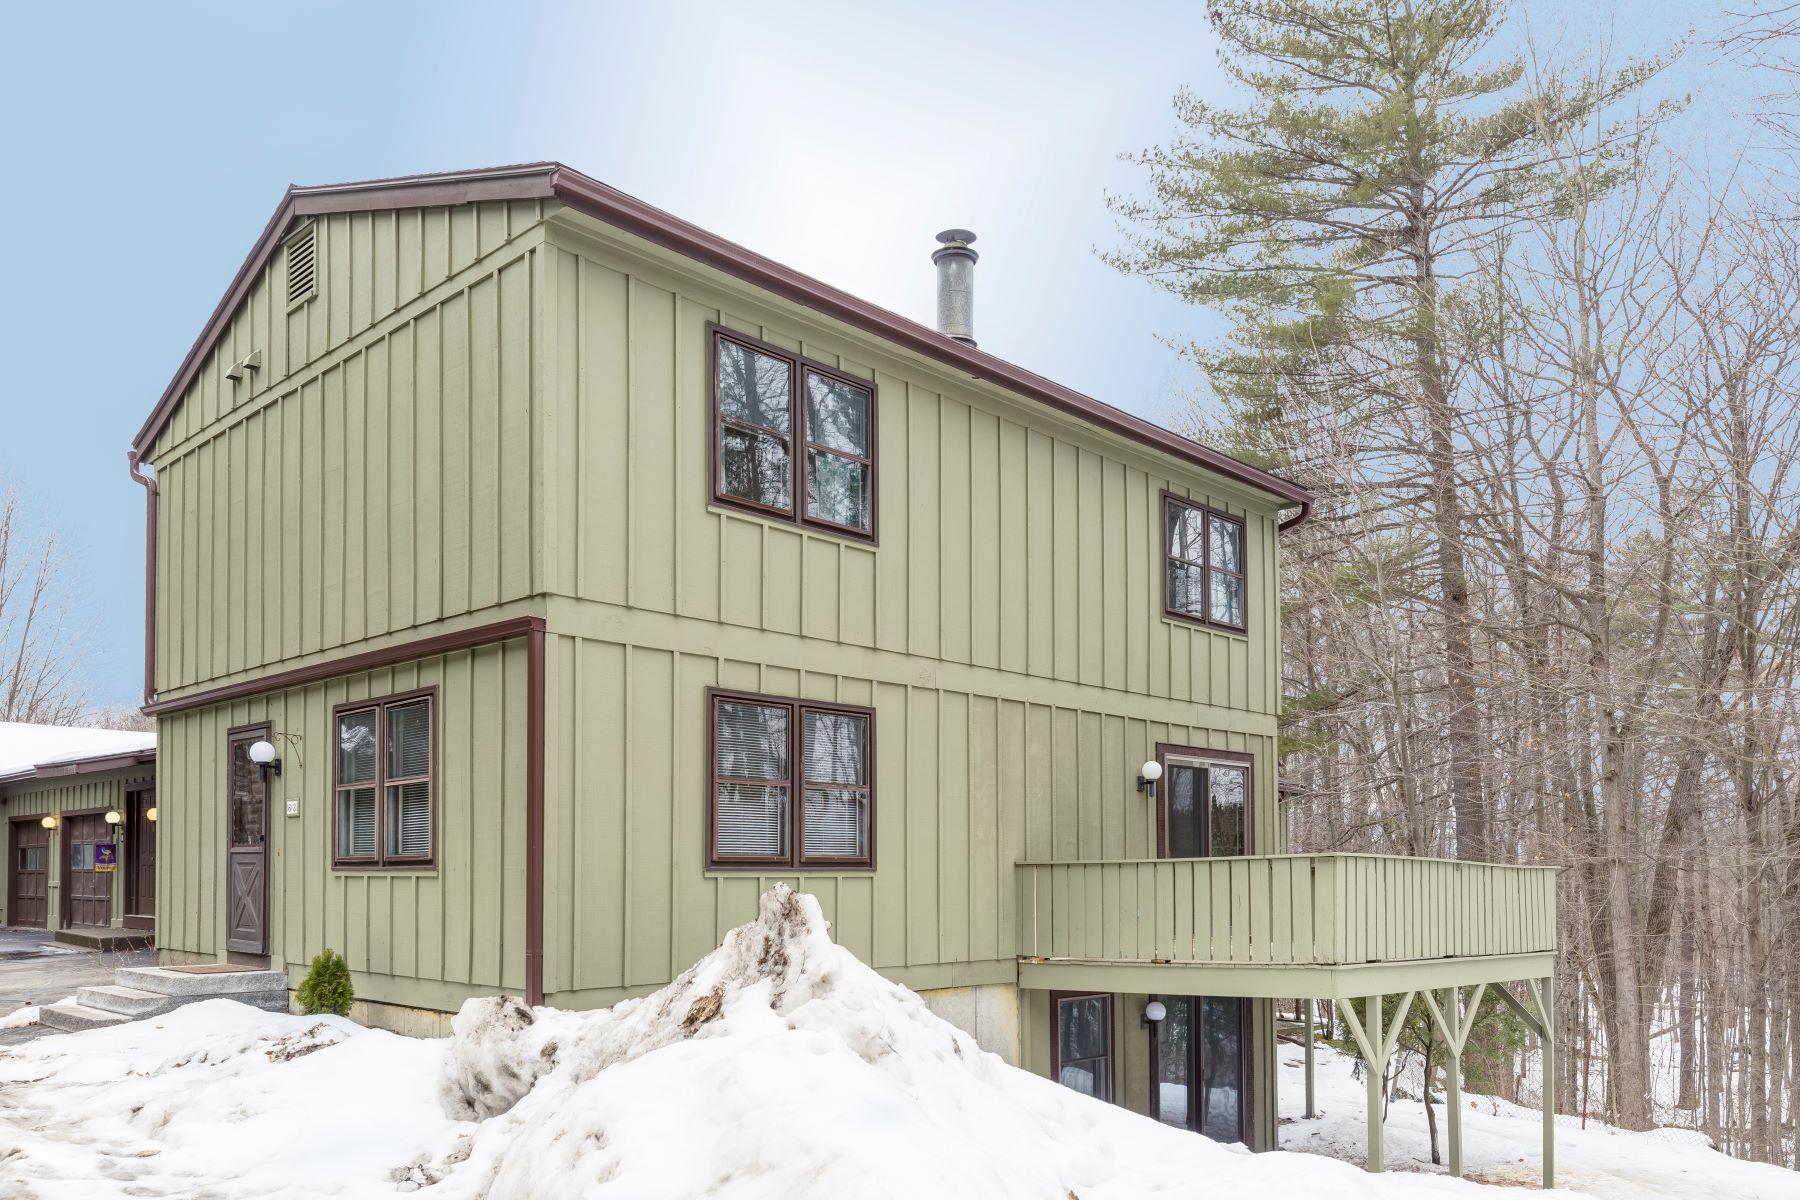 Condominiums for Sale at Three Bedroom Townhouse Condo in West Lebanon 27 Pleasant Street 63 Lebanon, New Hampshire 03784 United States